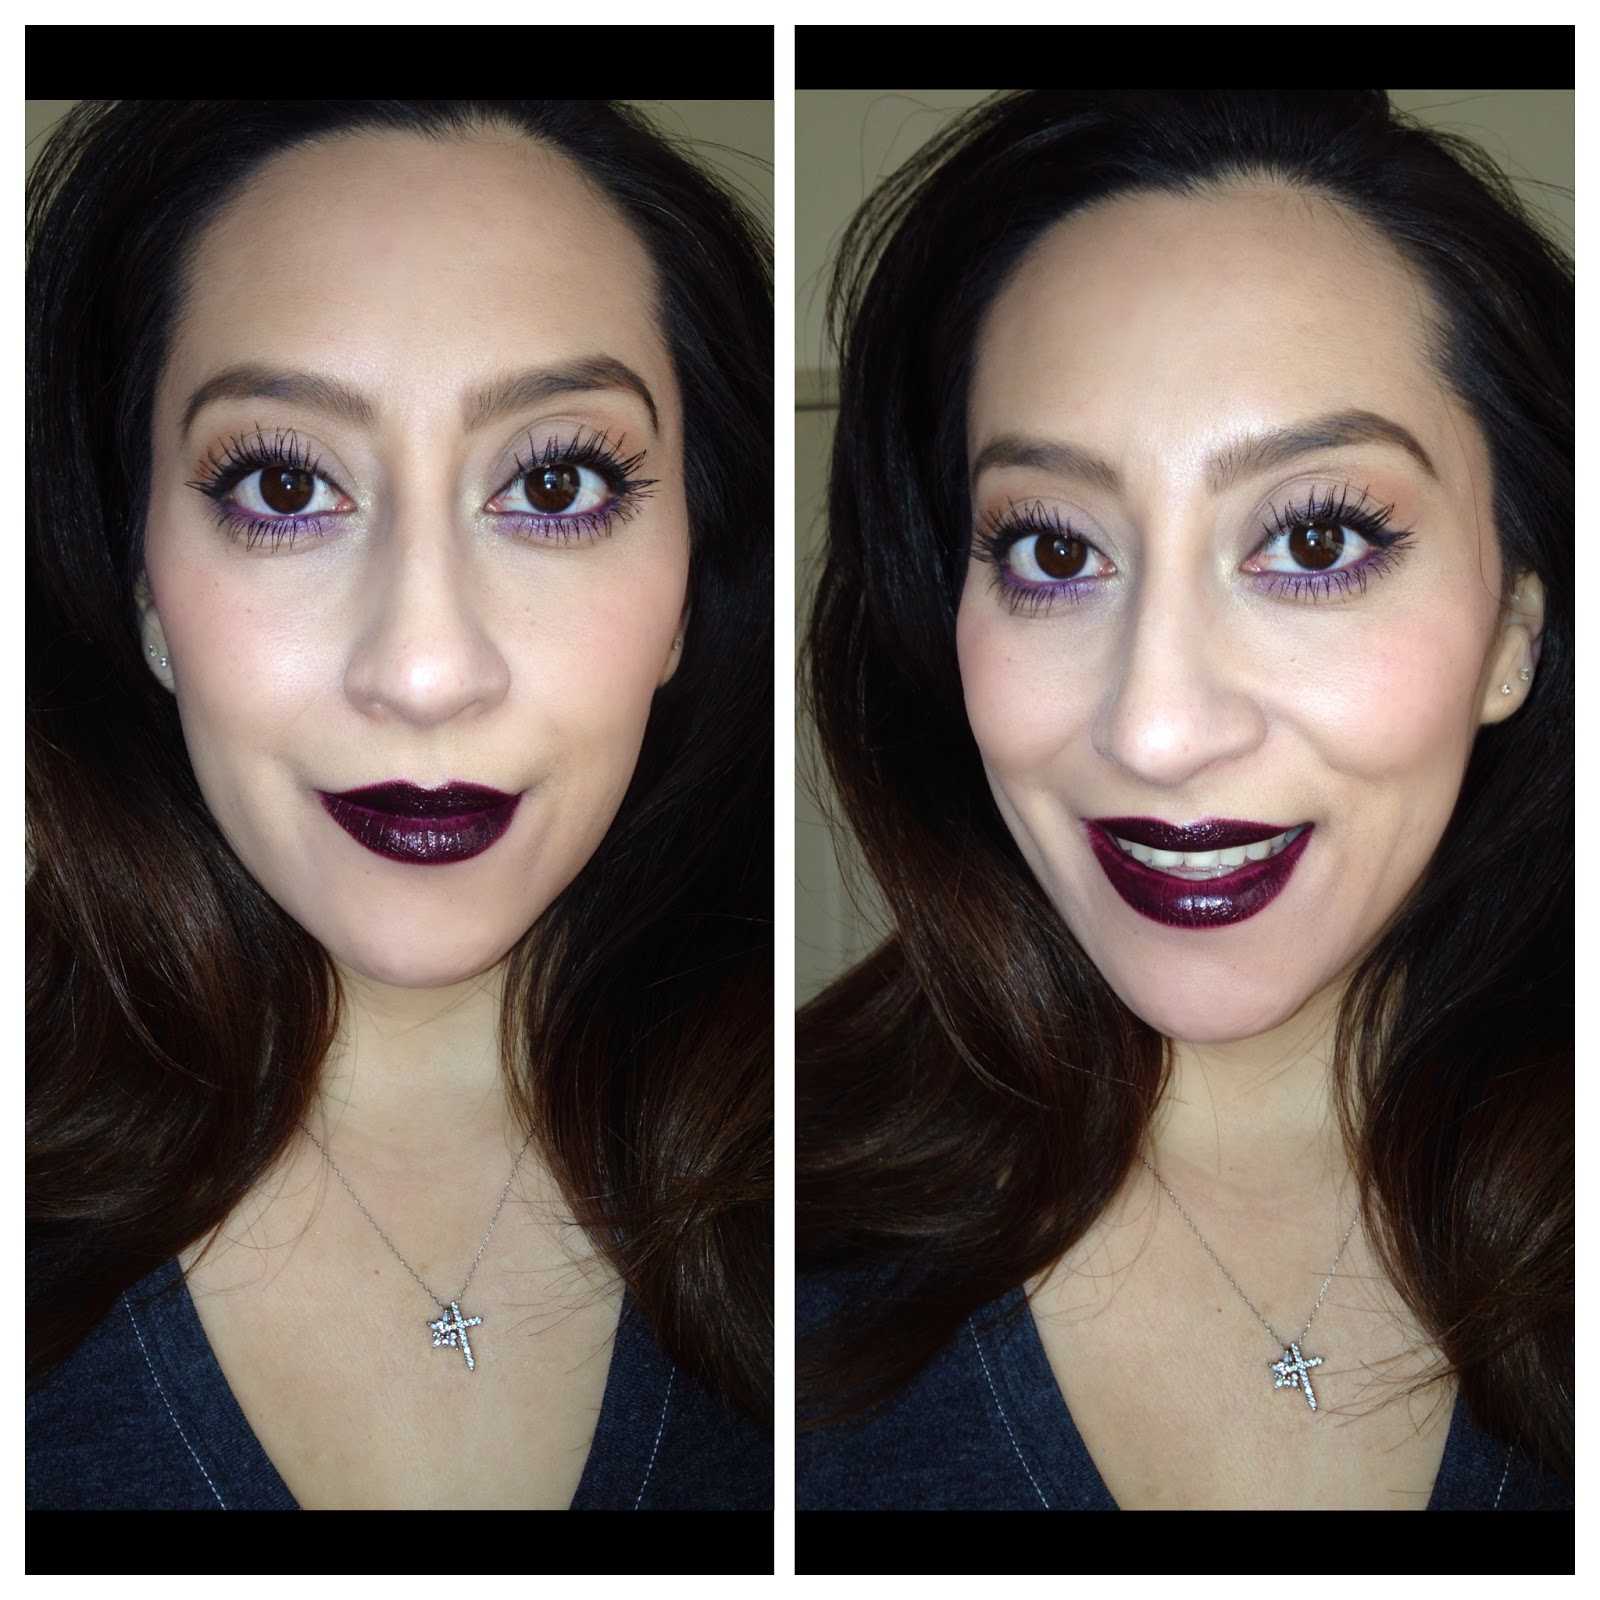 NYX High Voltage lipstick in Dahlia